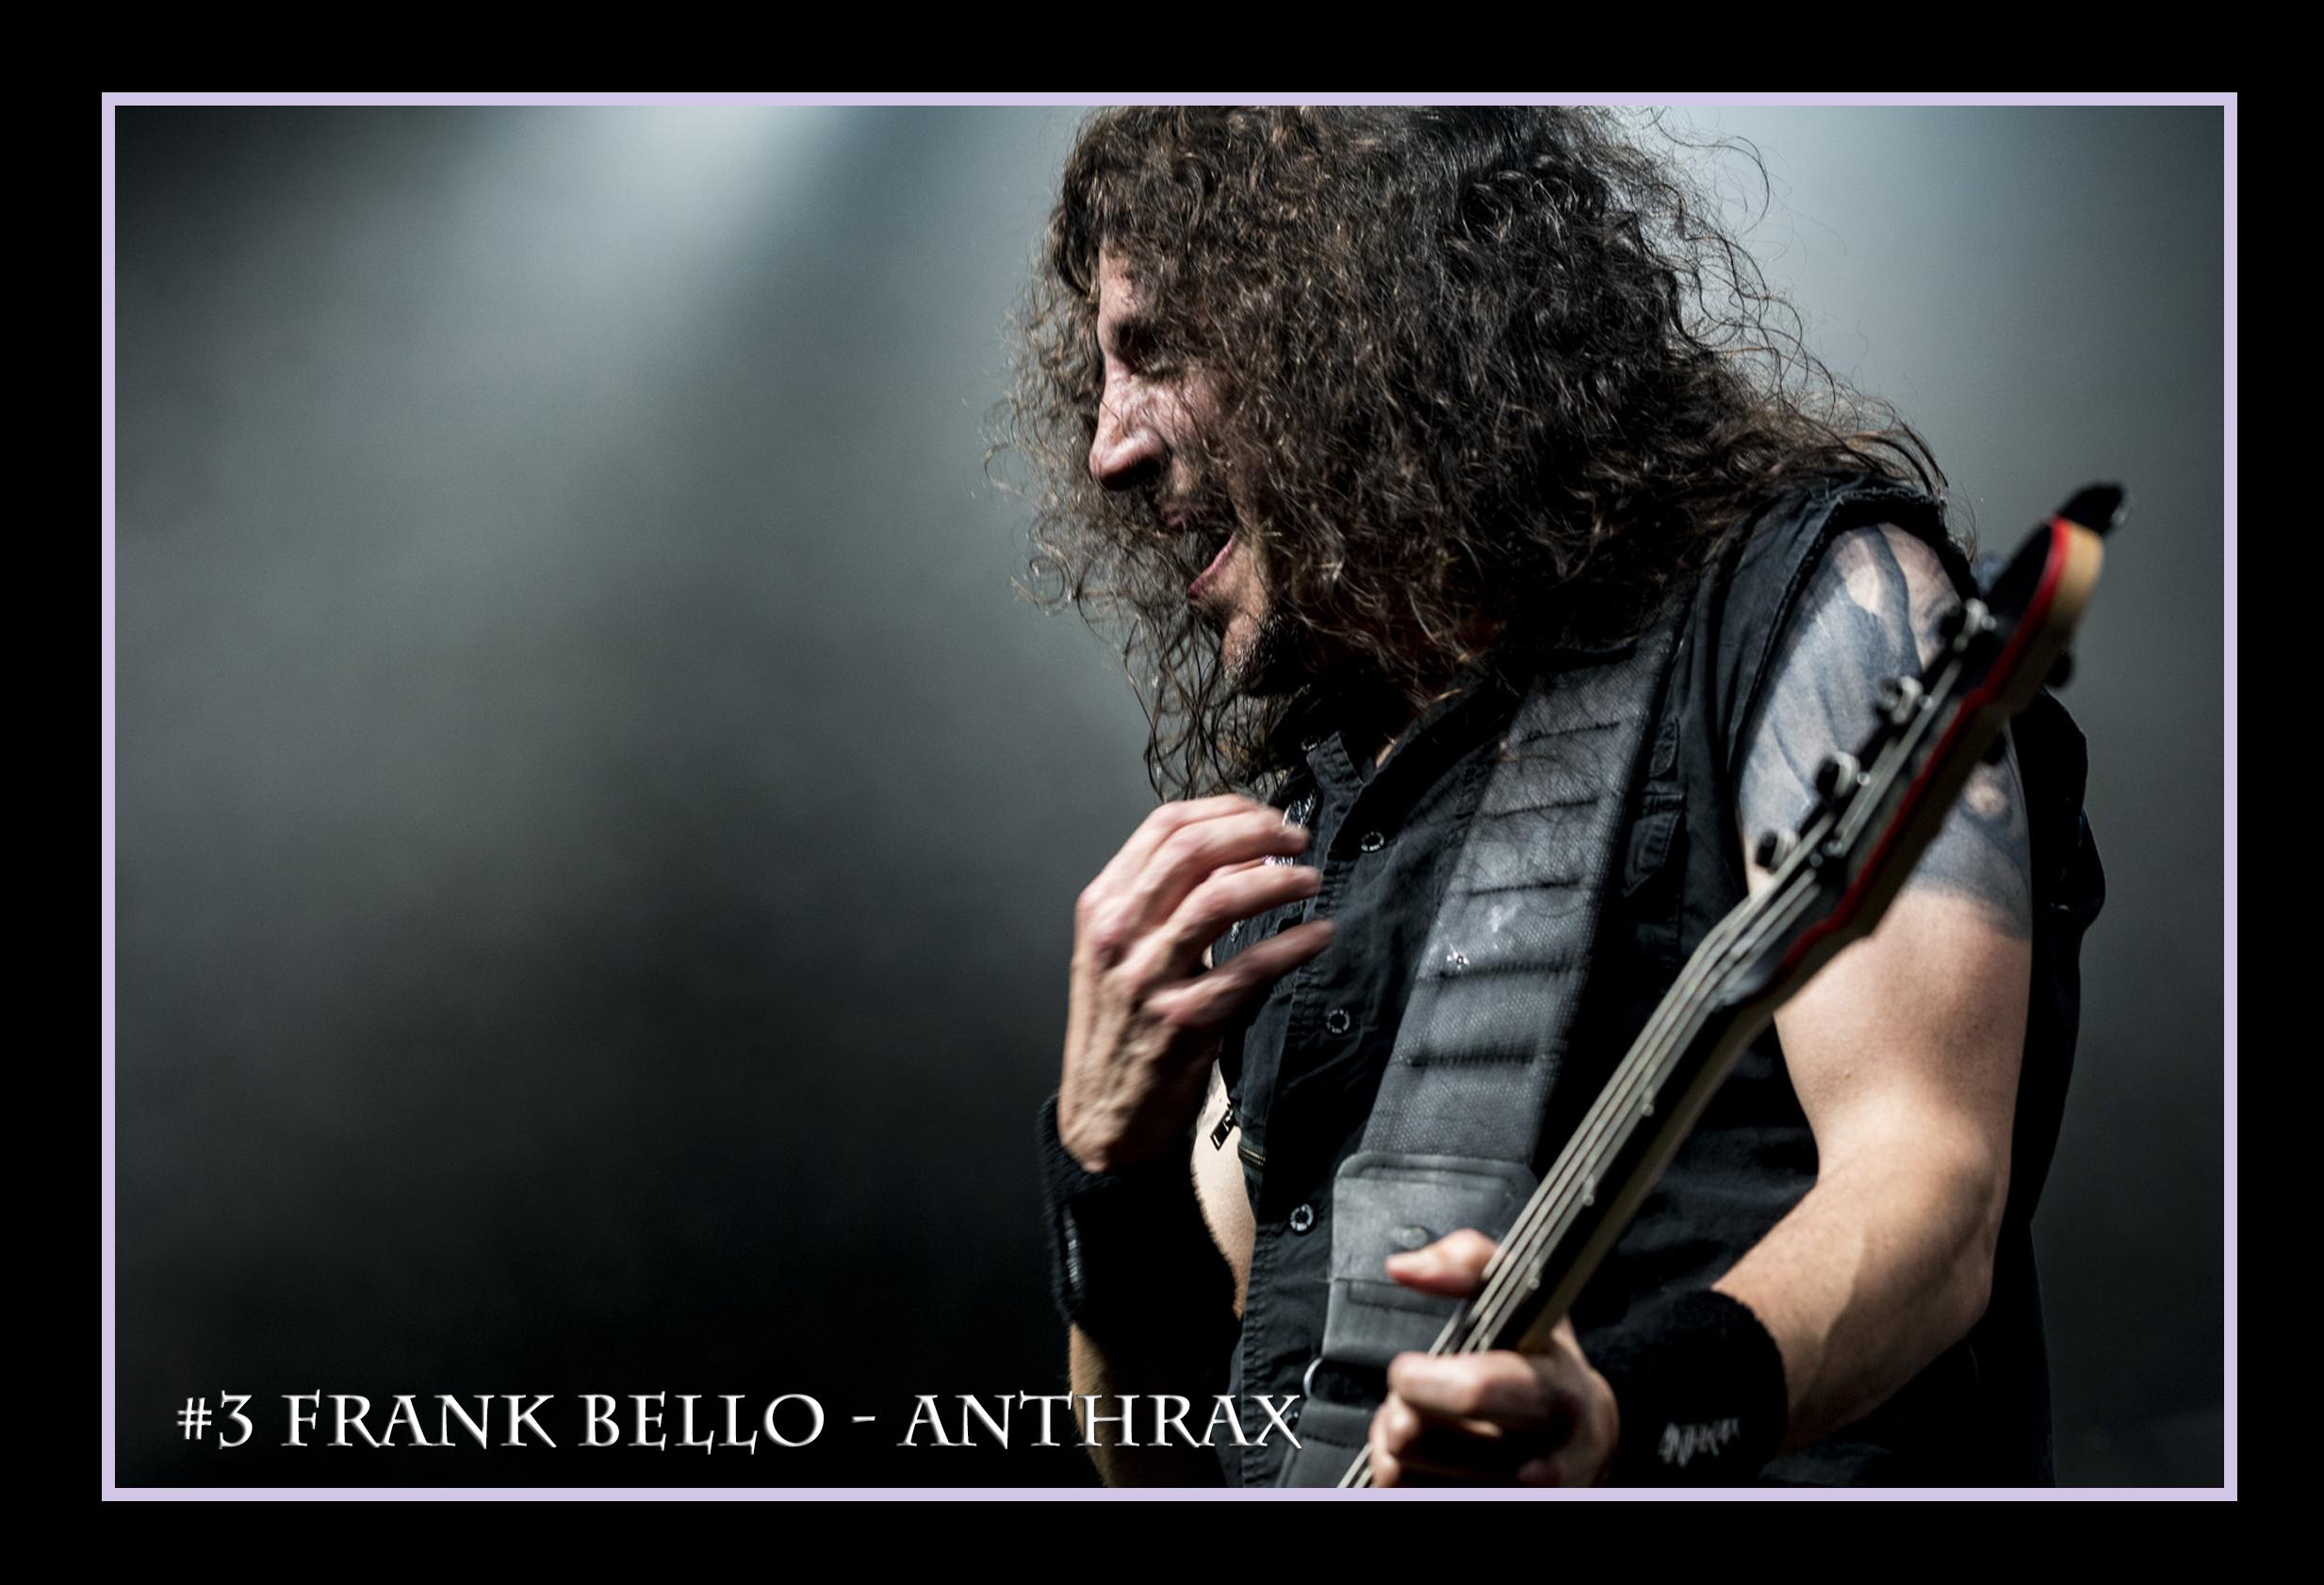 Frank Bello